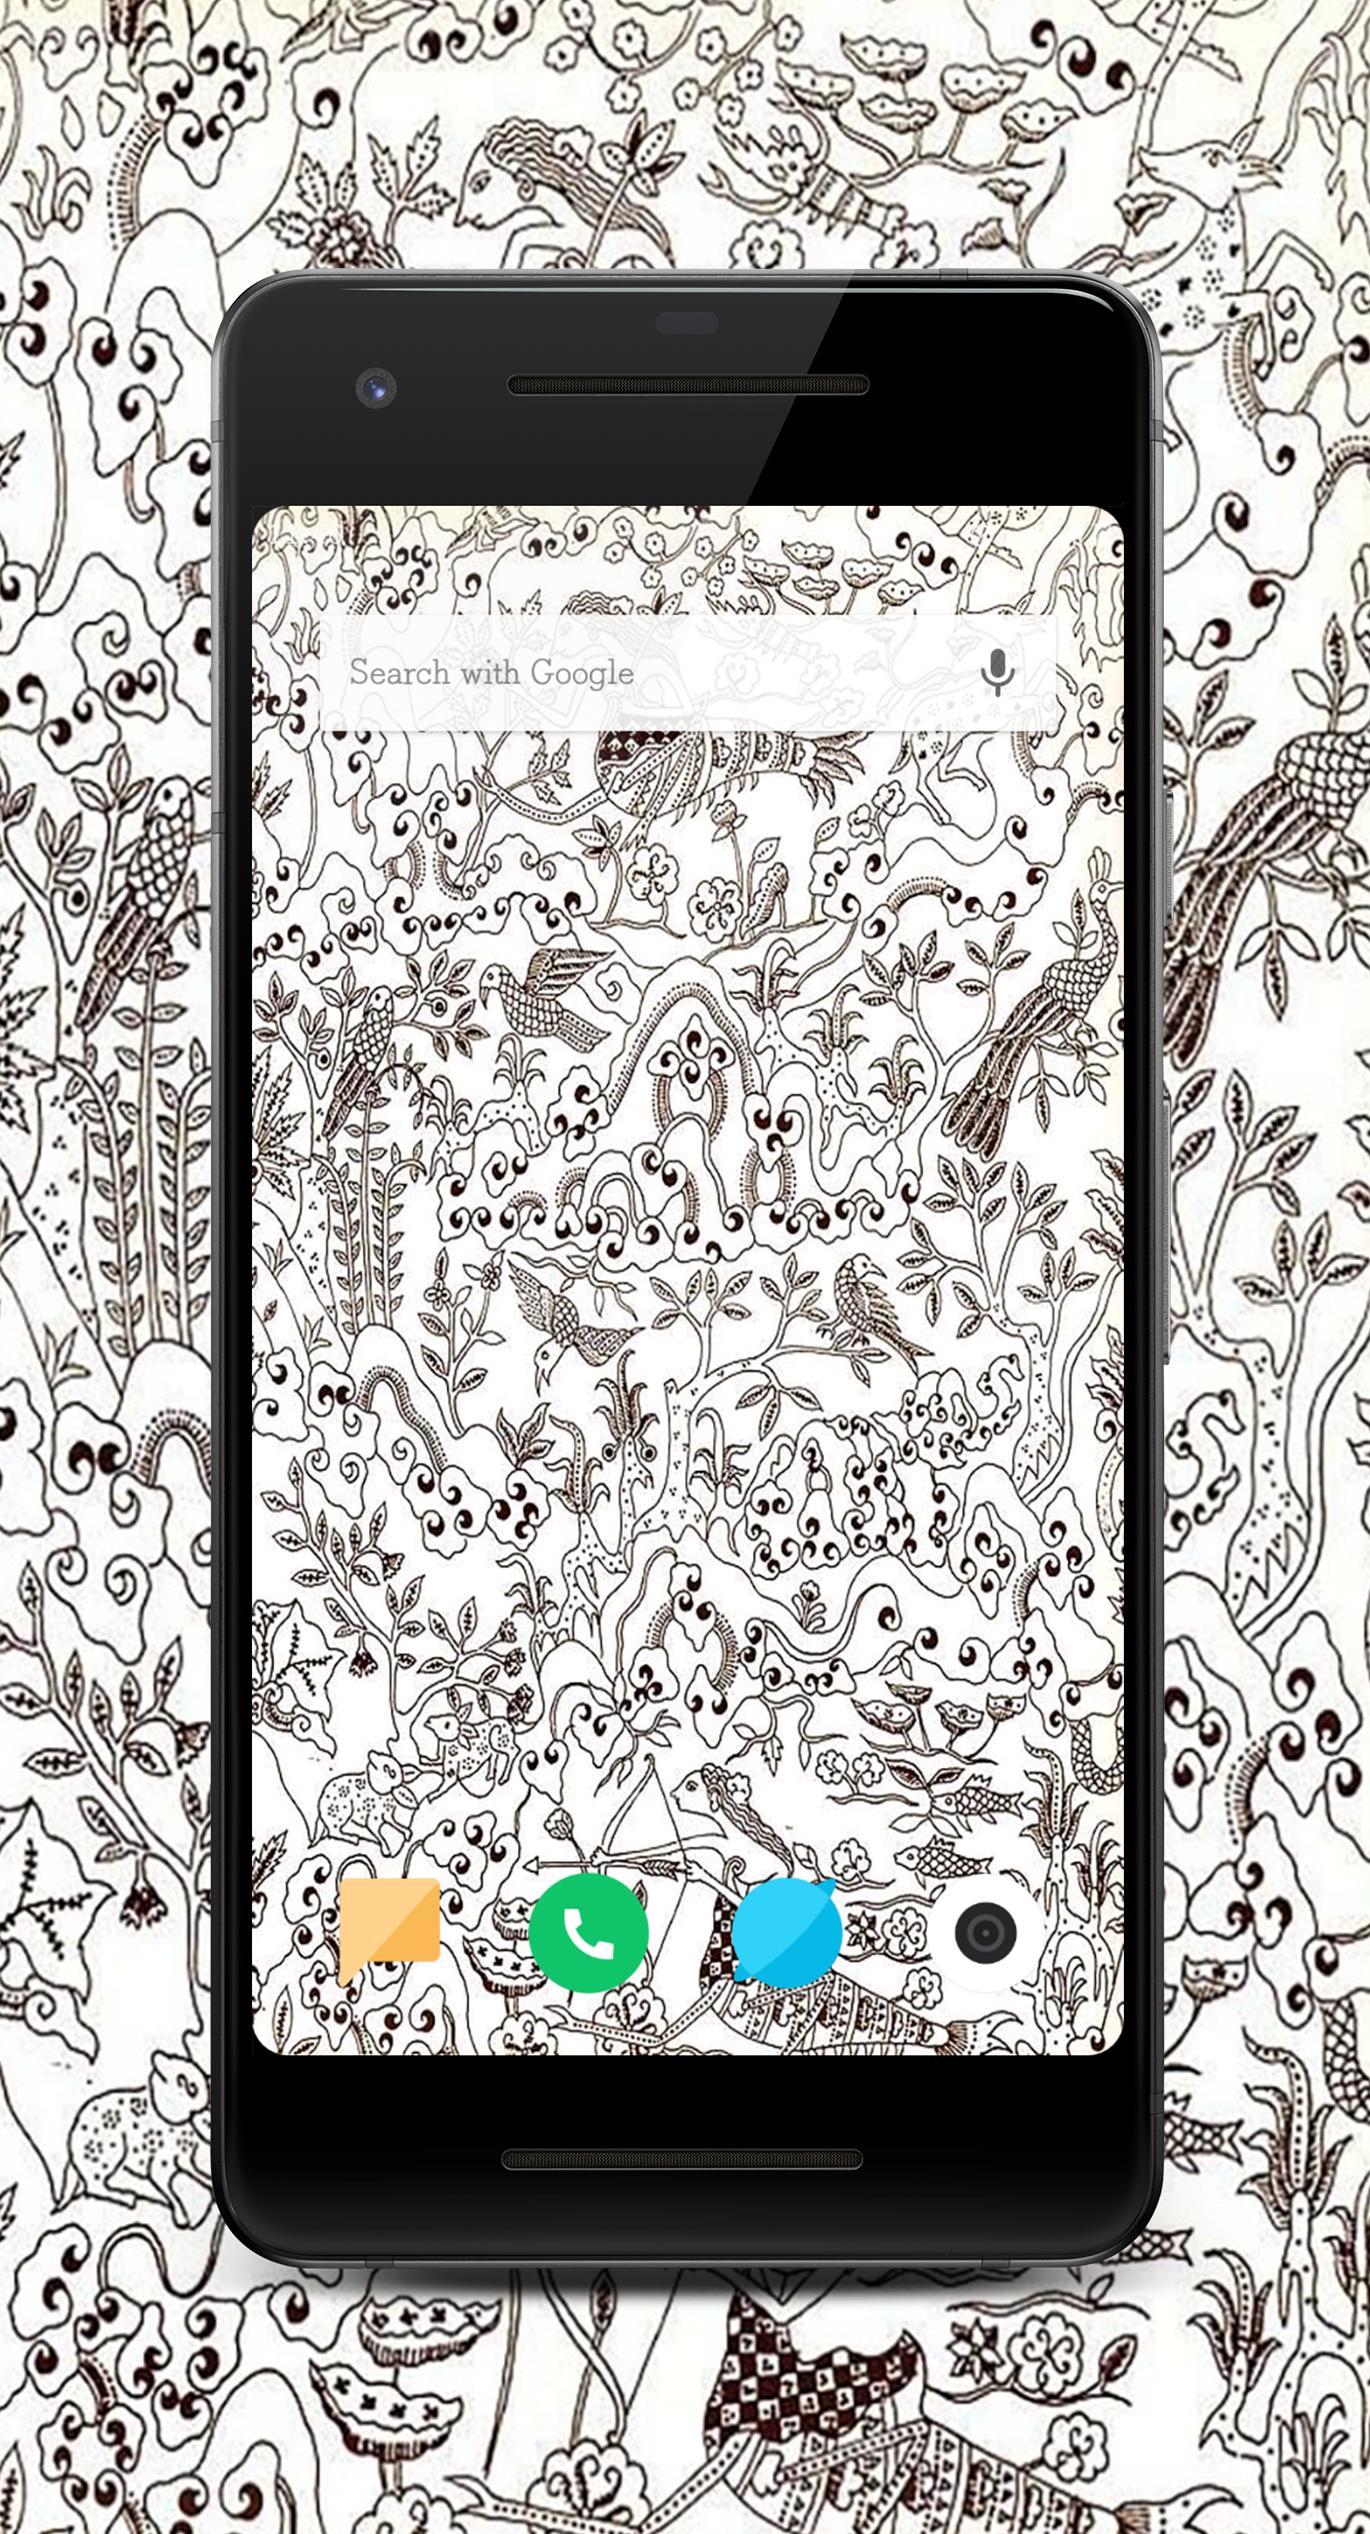 Batik Hd Wallpaper For Android Apk Download